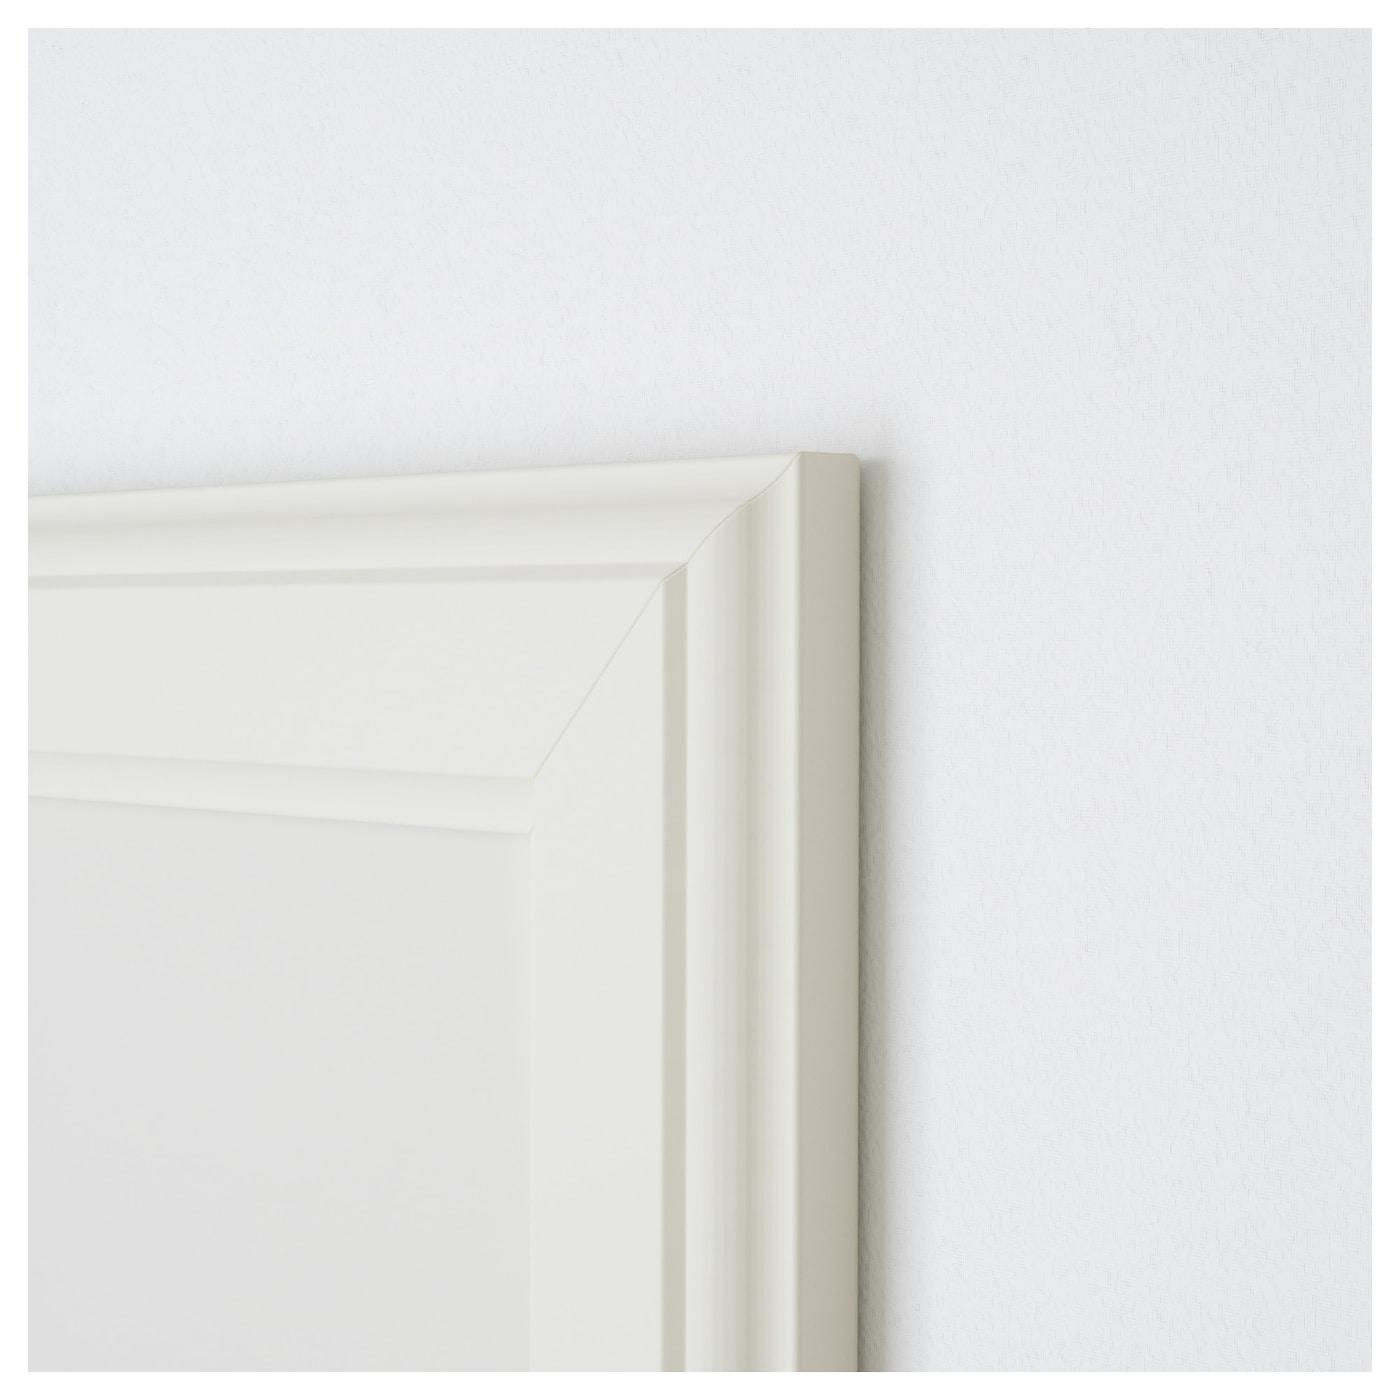 VIRSERUM Frame White 61 x 91 cm - IKEA